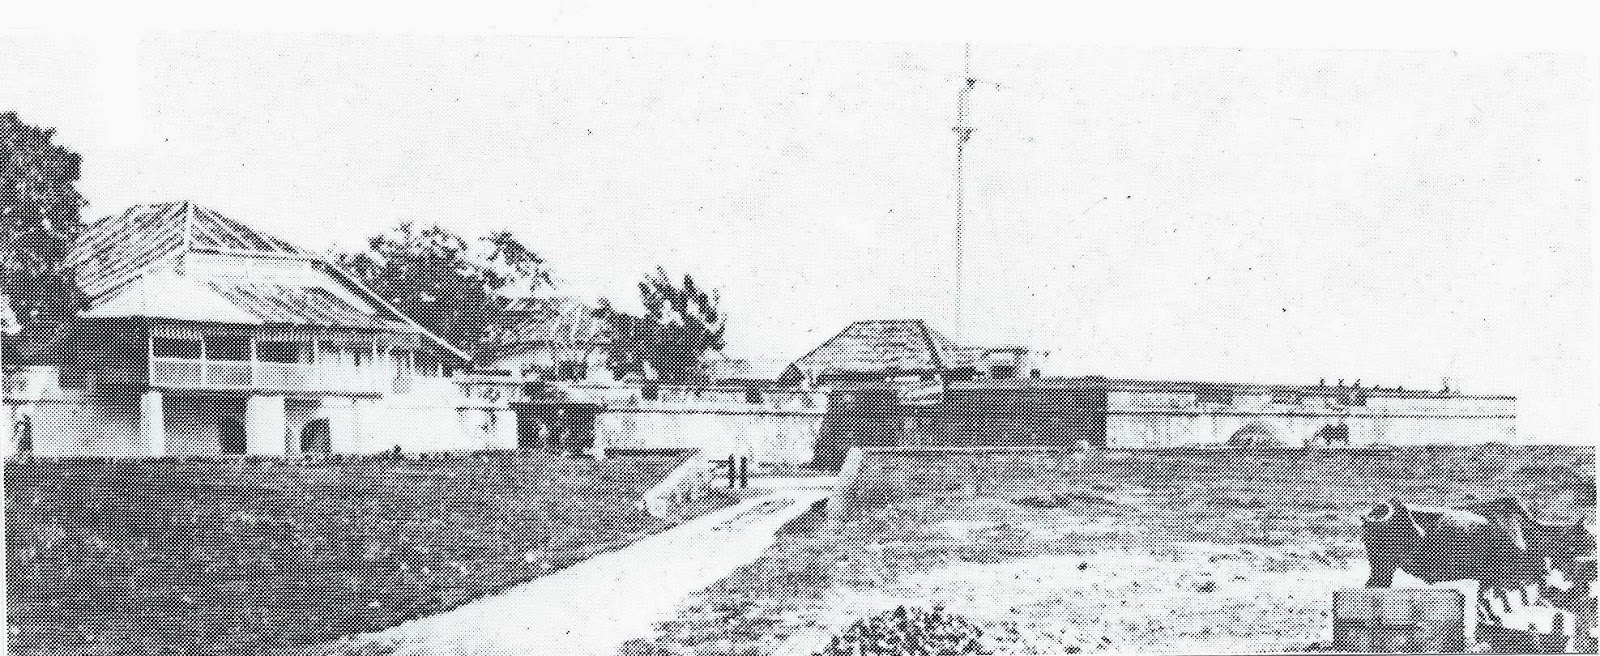 Fort Cornwallis , Prince of Wales Island (Pulau Pinang) circa 1850's. From the Museum Negara, Kuala Lumpur, collection.